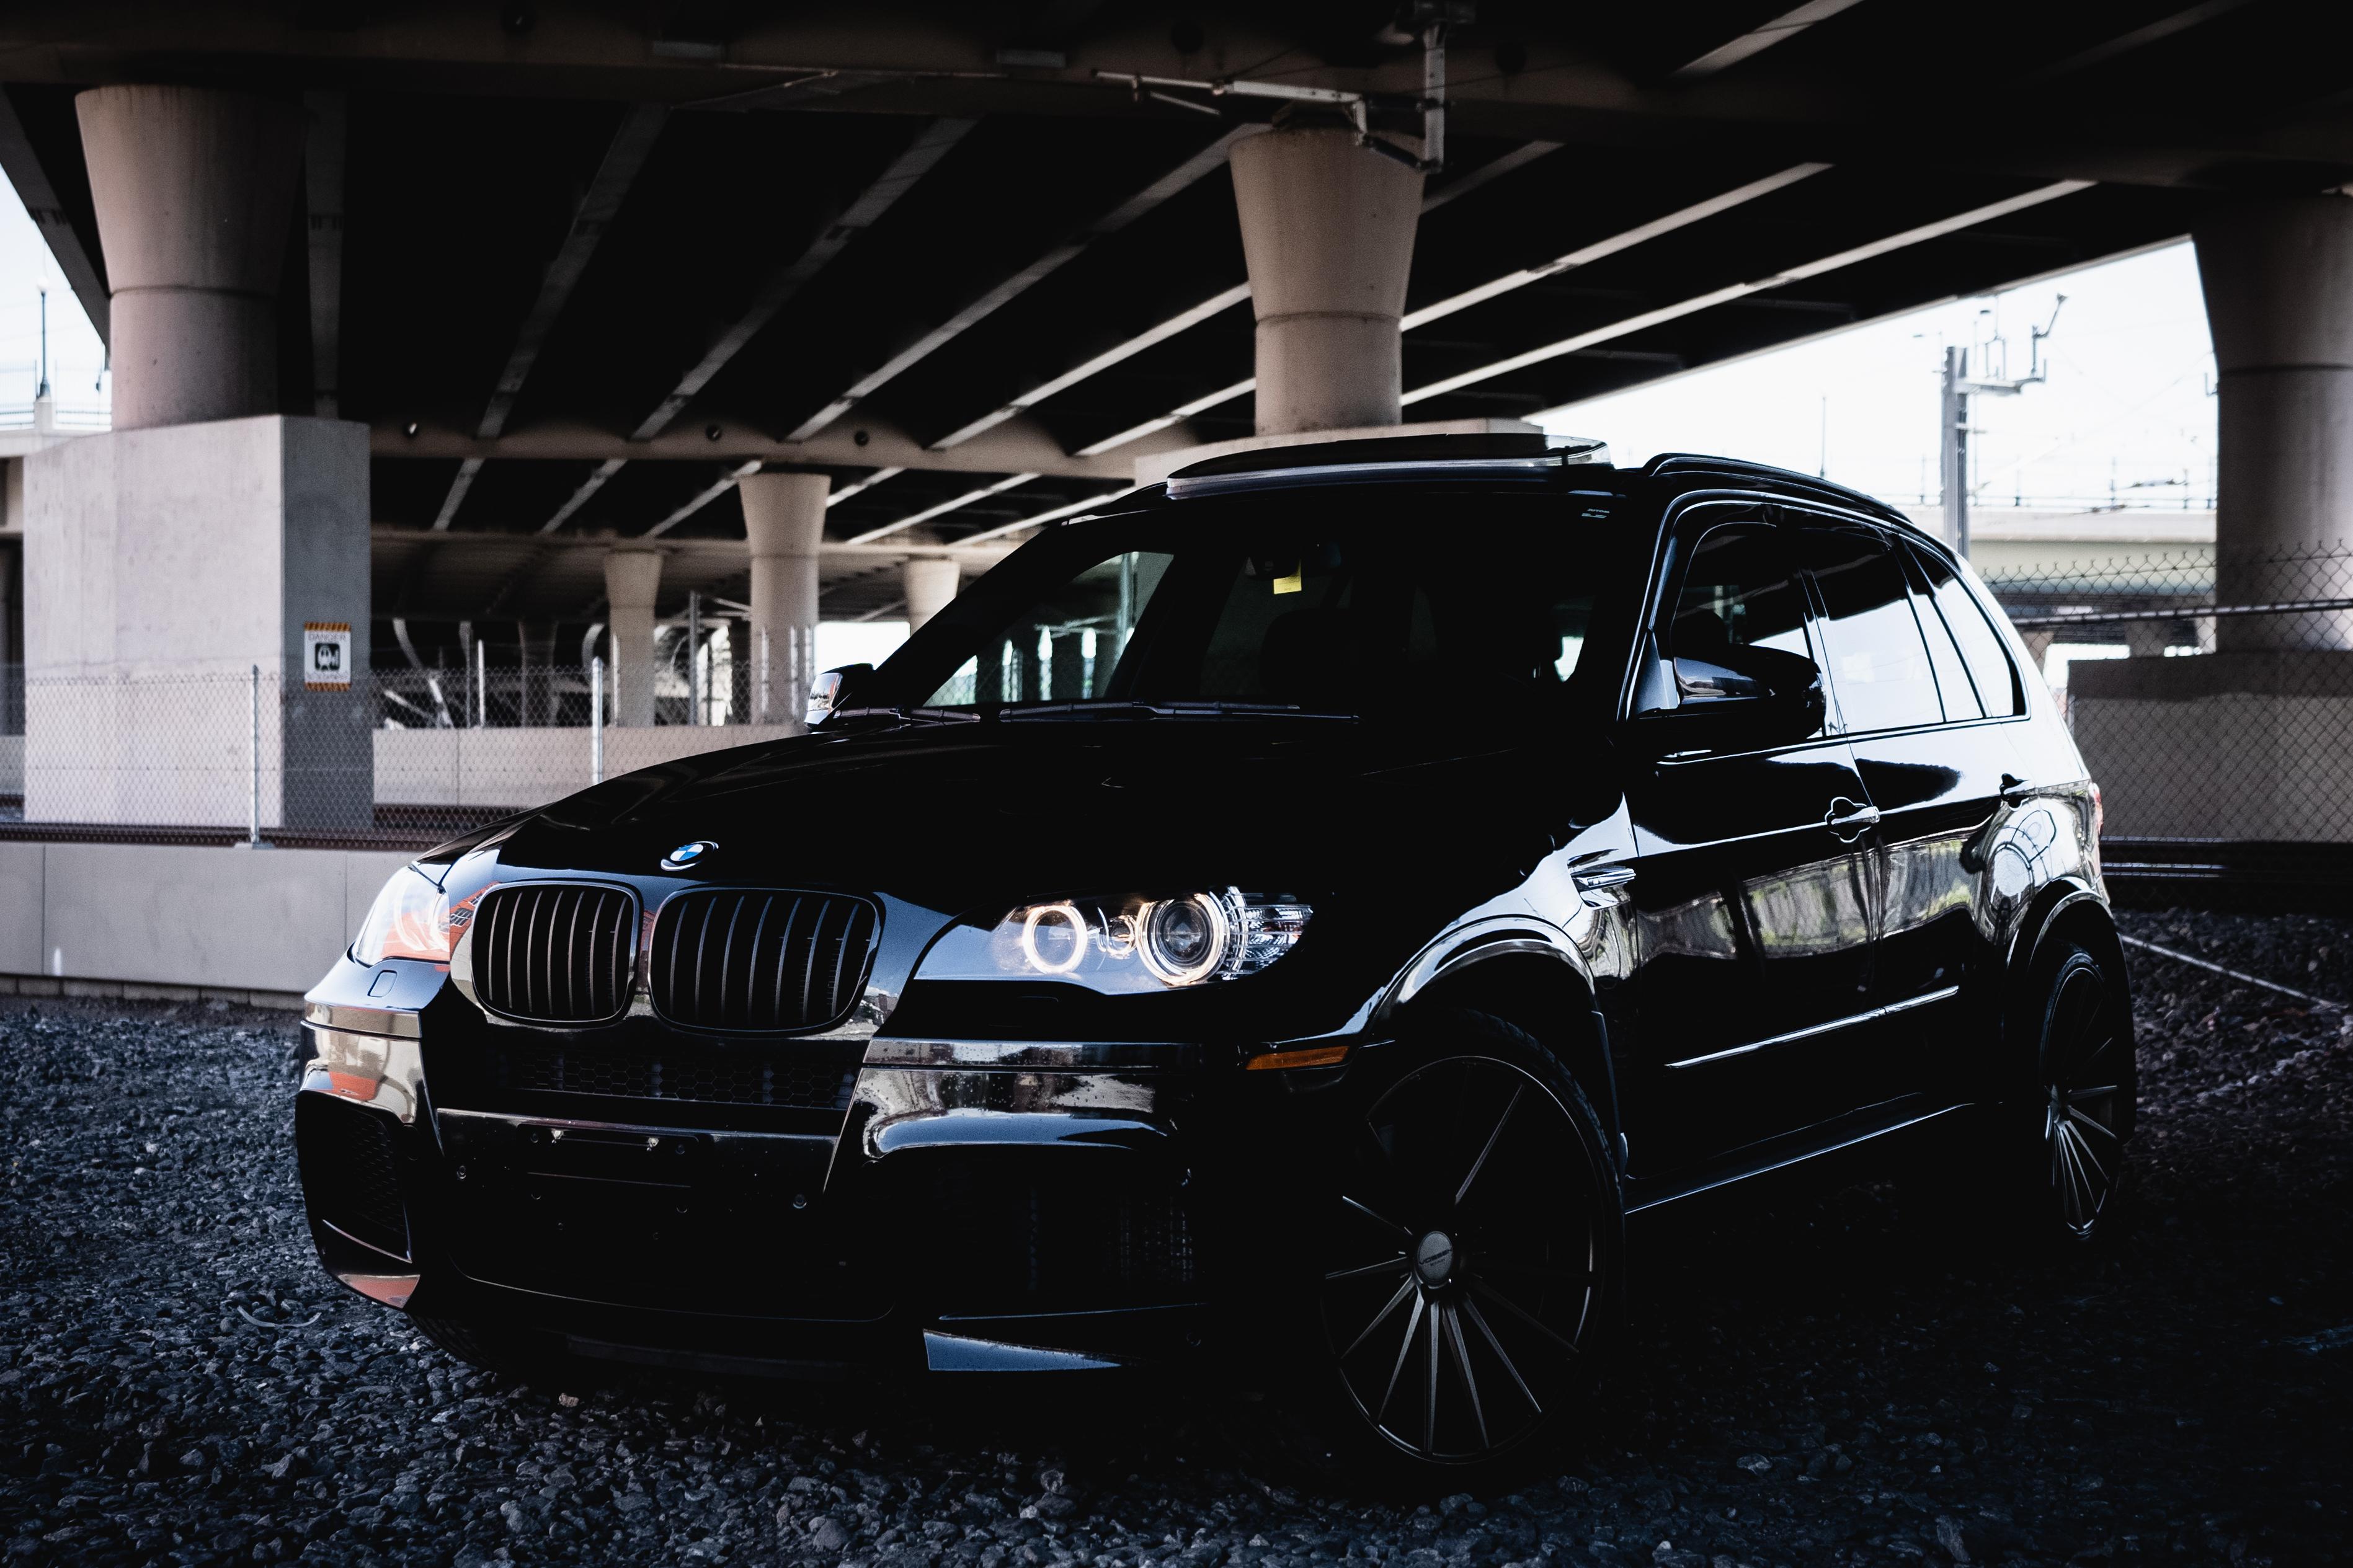 2011 BMW X5M | Unique Cars for Sale | Cult Cars LLC | United